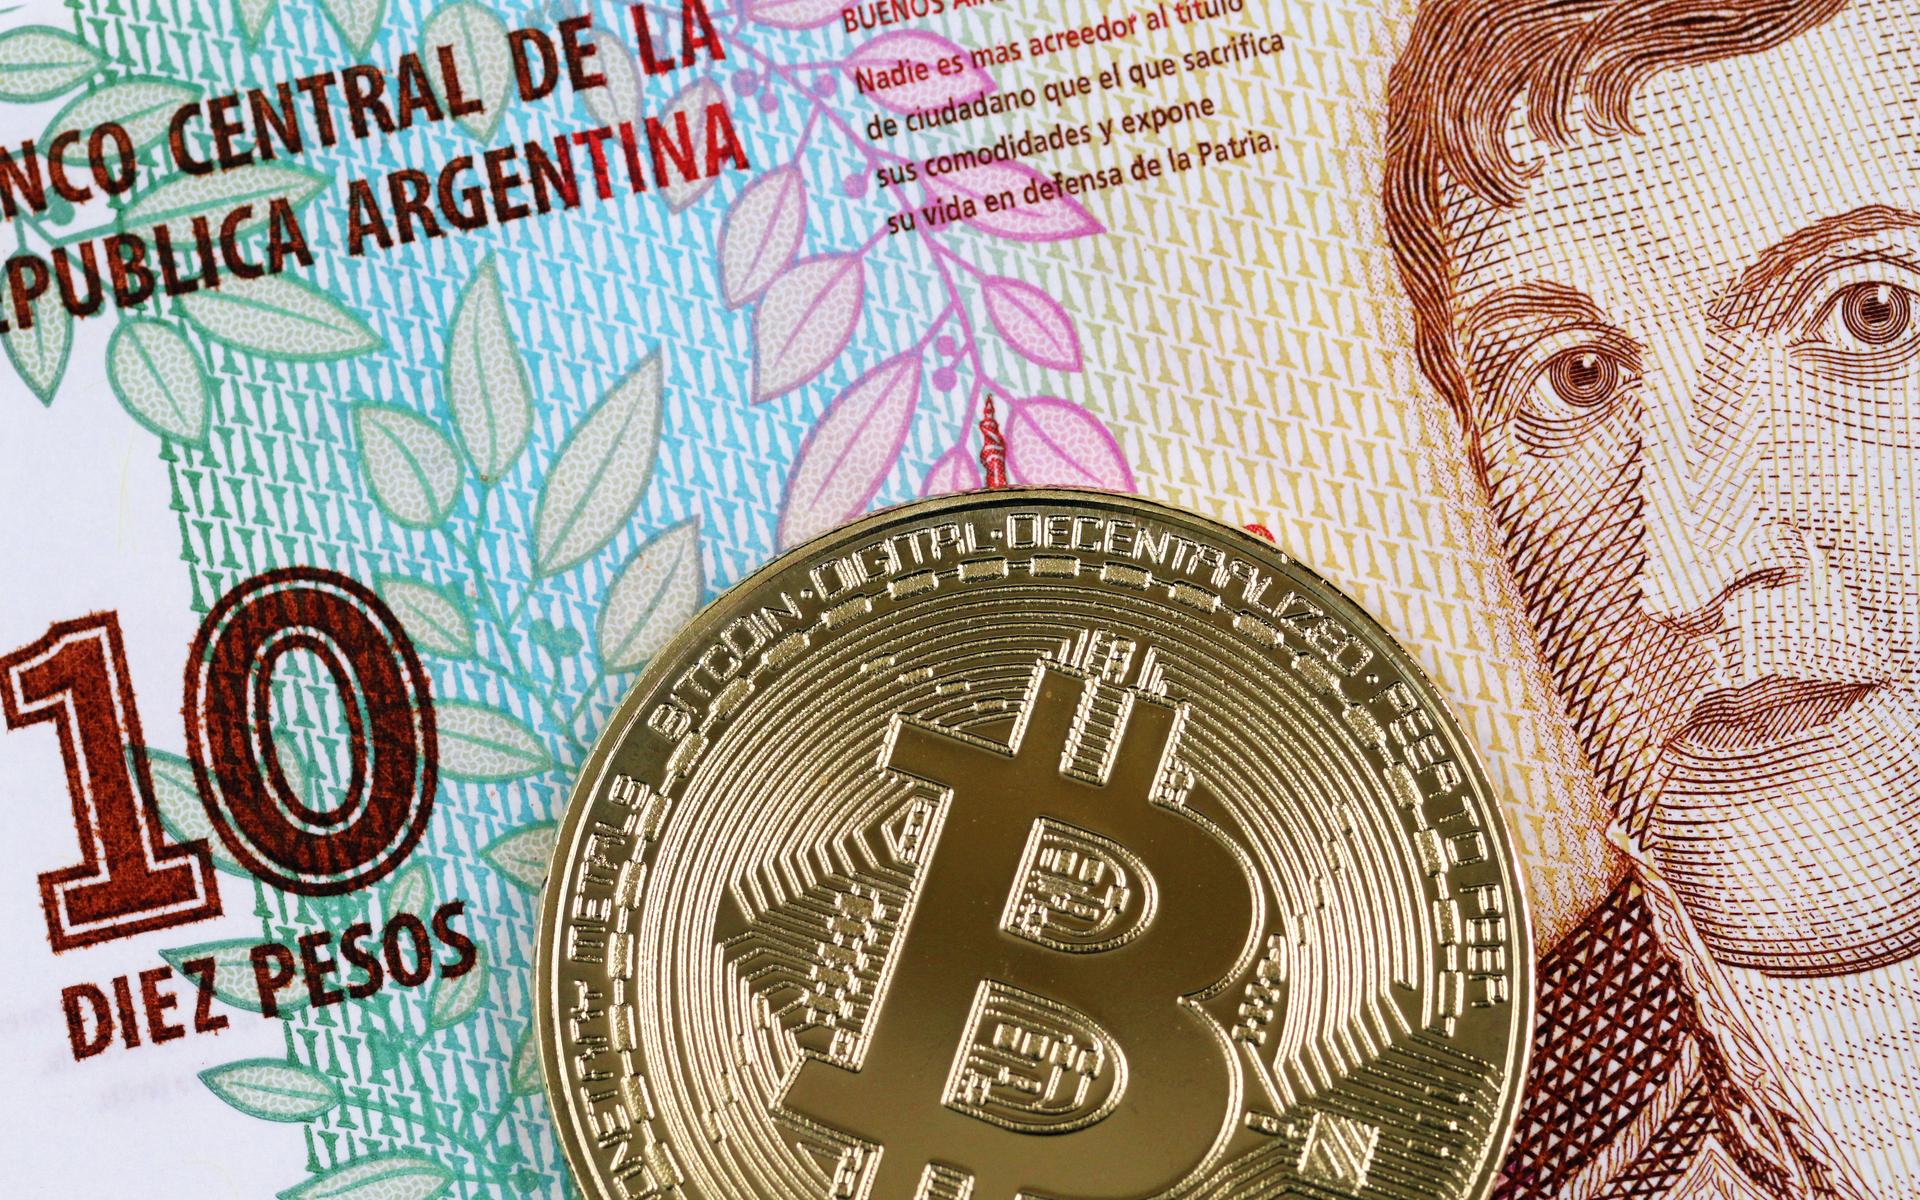 Bitcoin price hits $12,000 on Argentina exchange